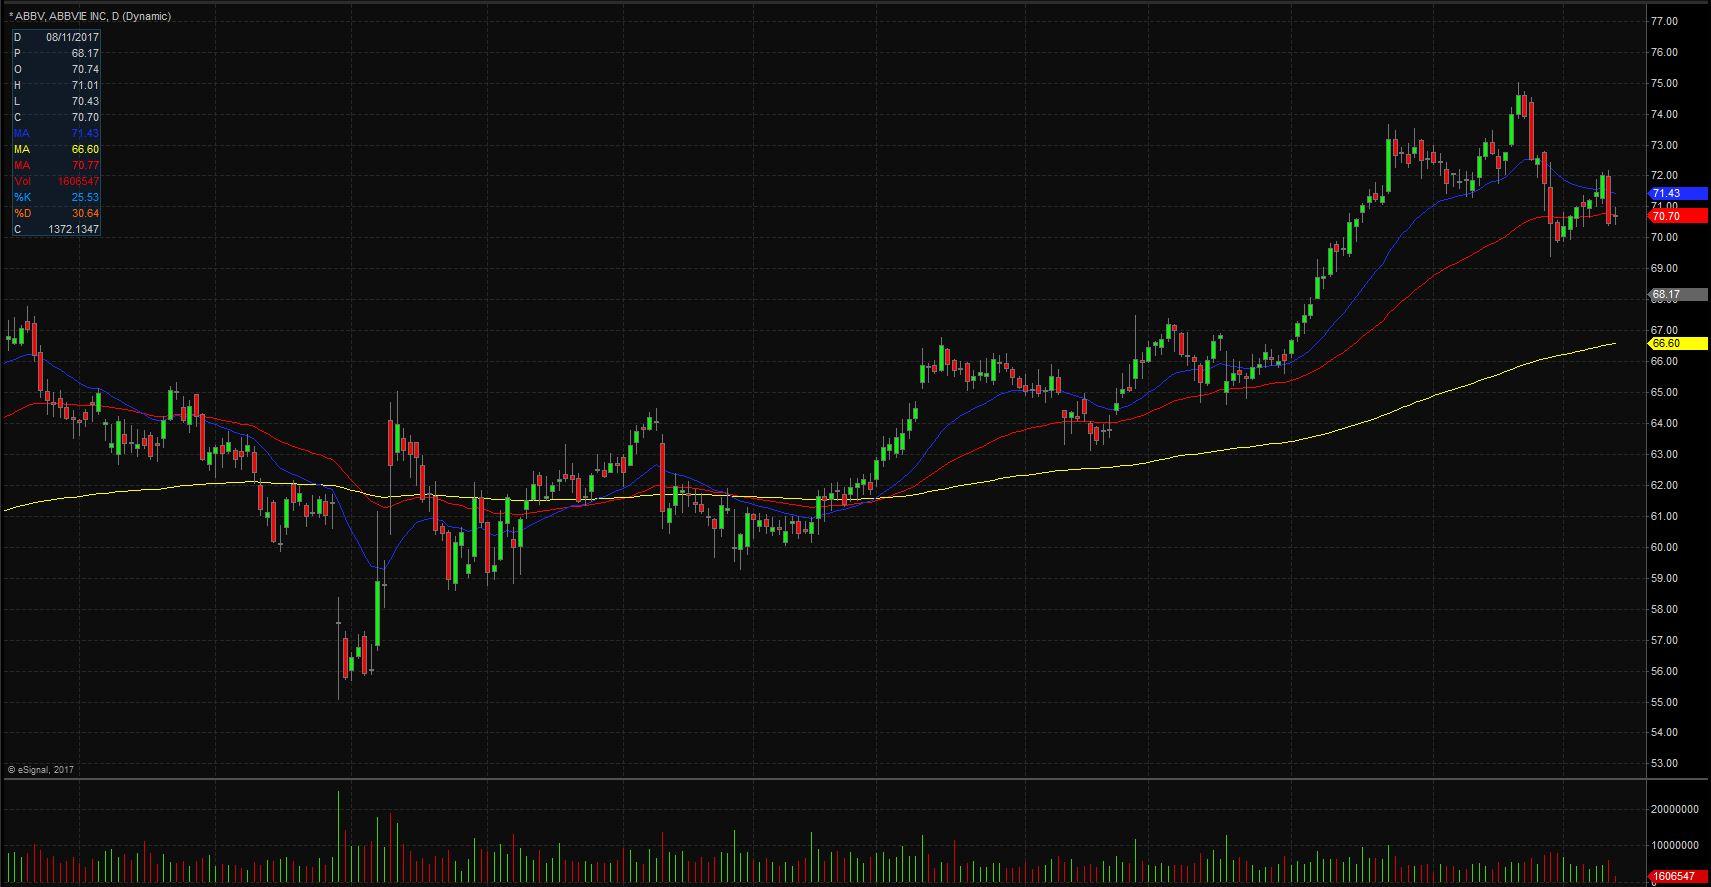 AbbVie stock chart